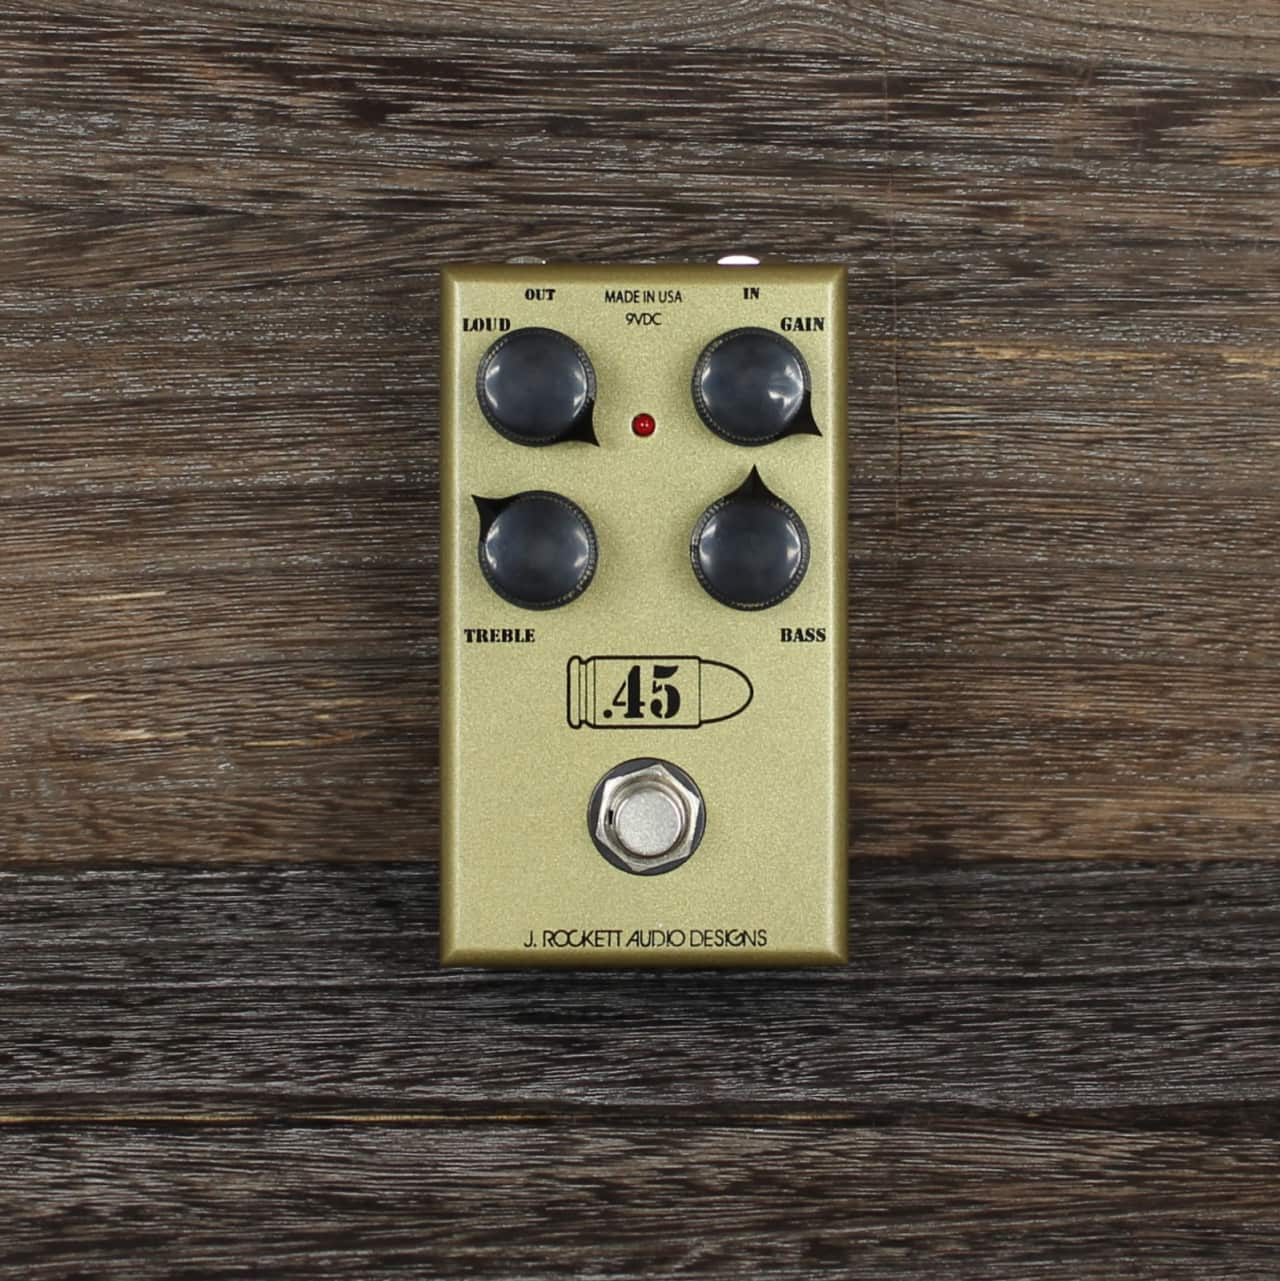 J rockett audio designs 45 caliber sound house music for 45 house music